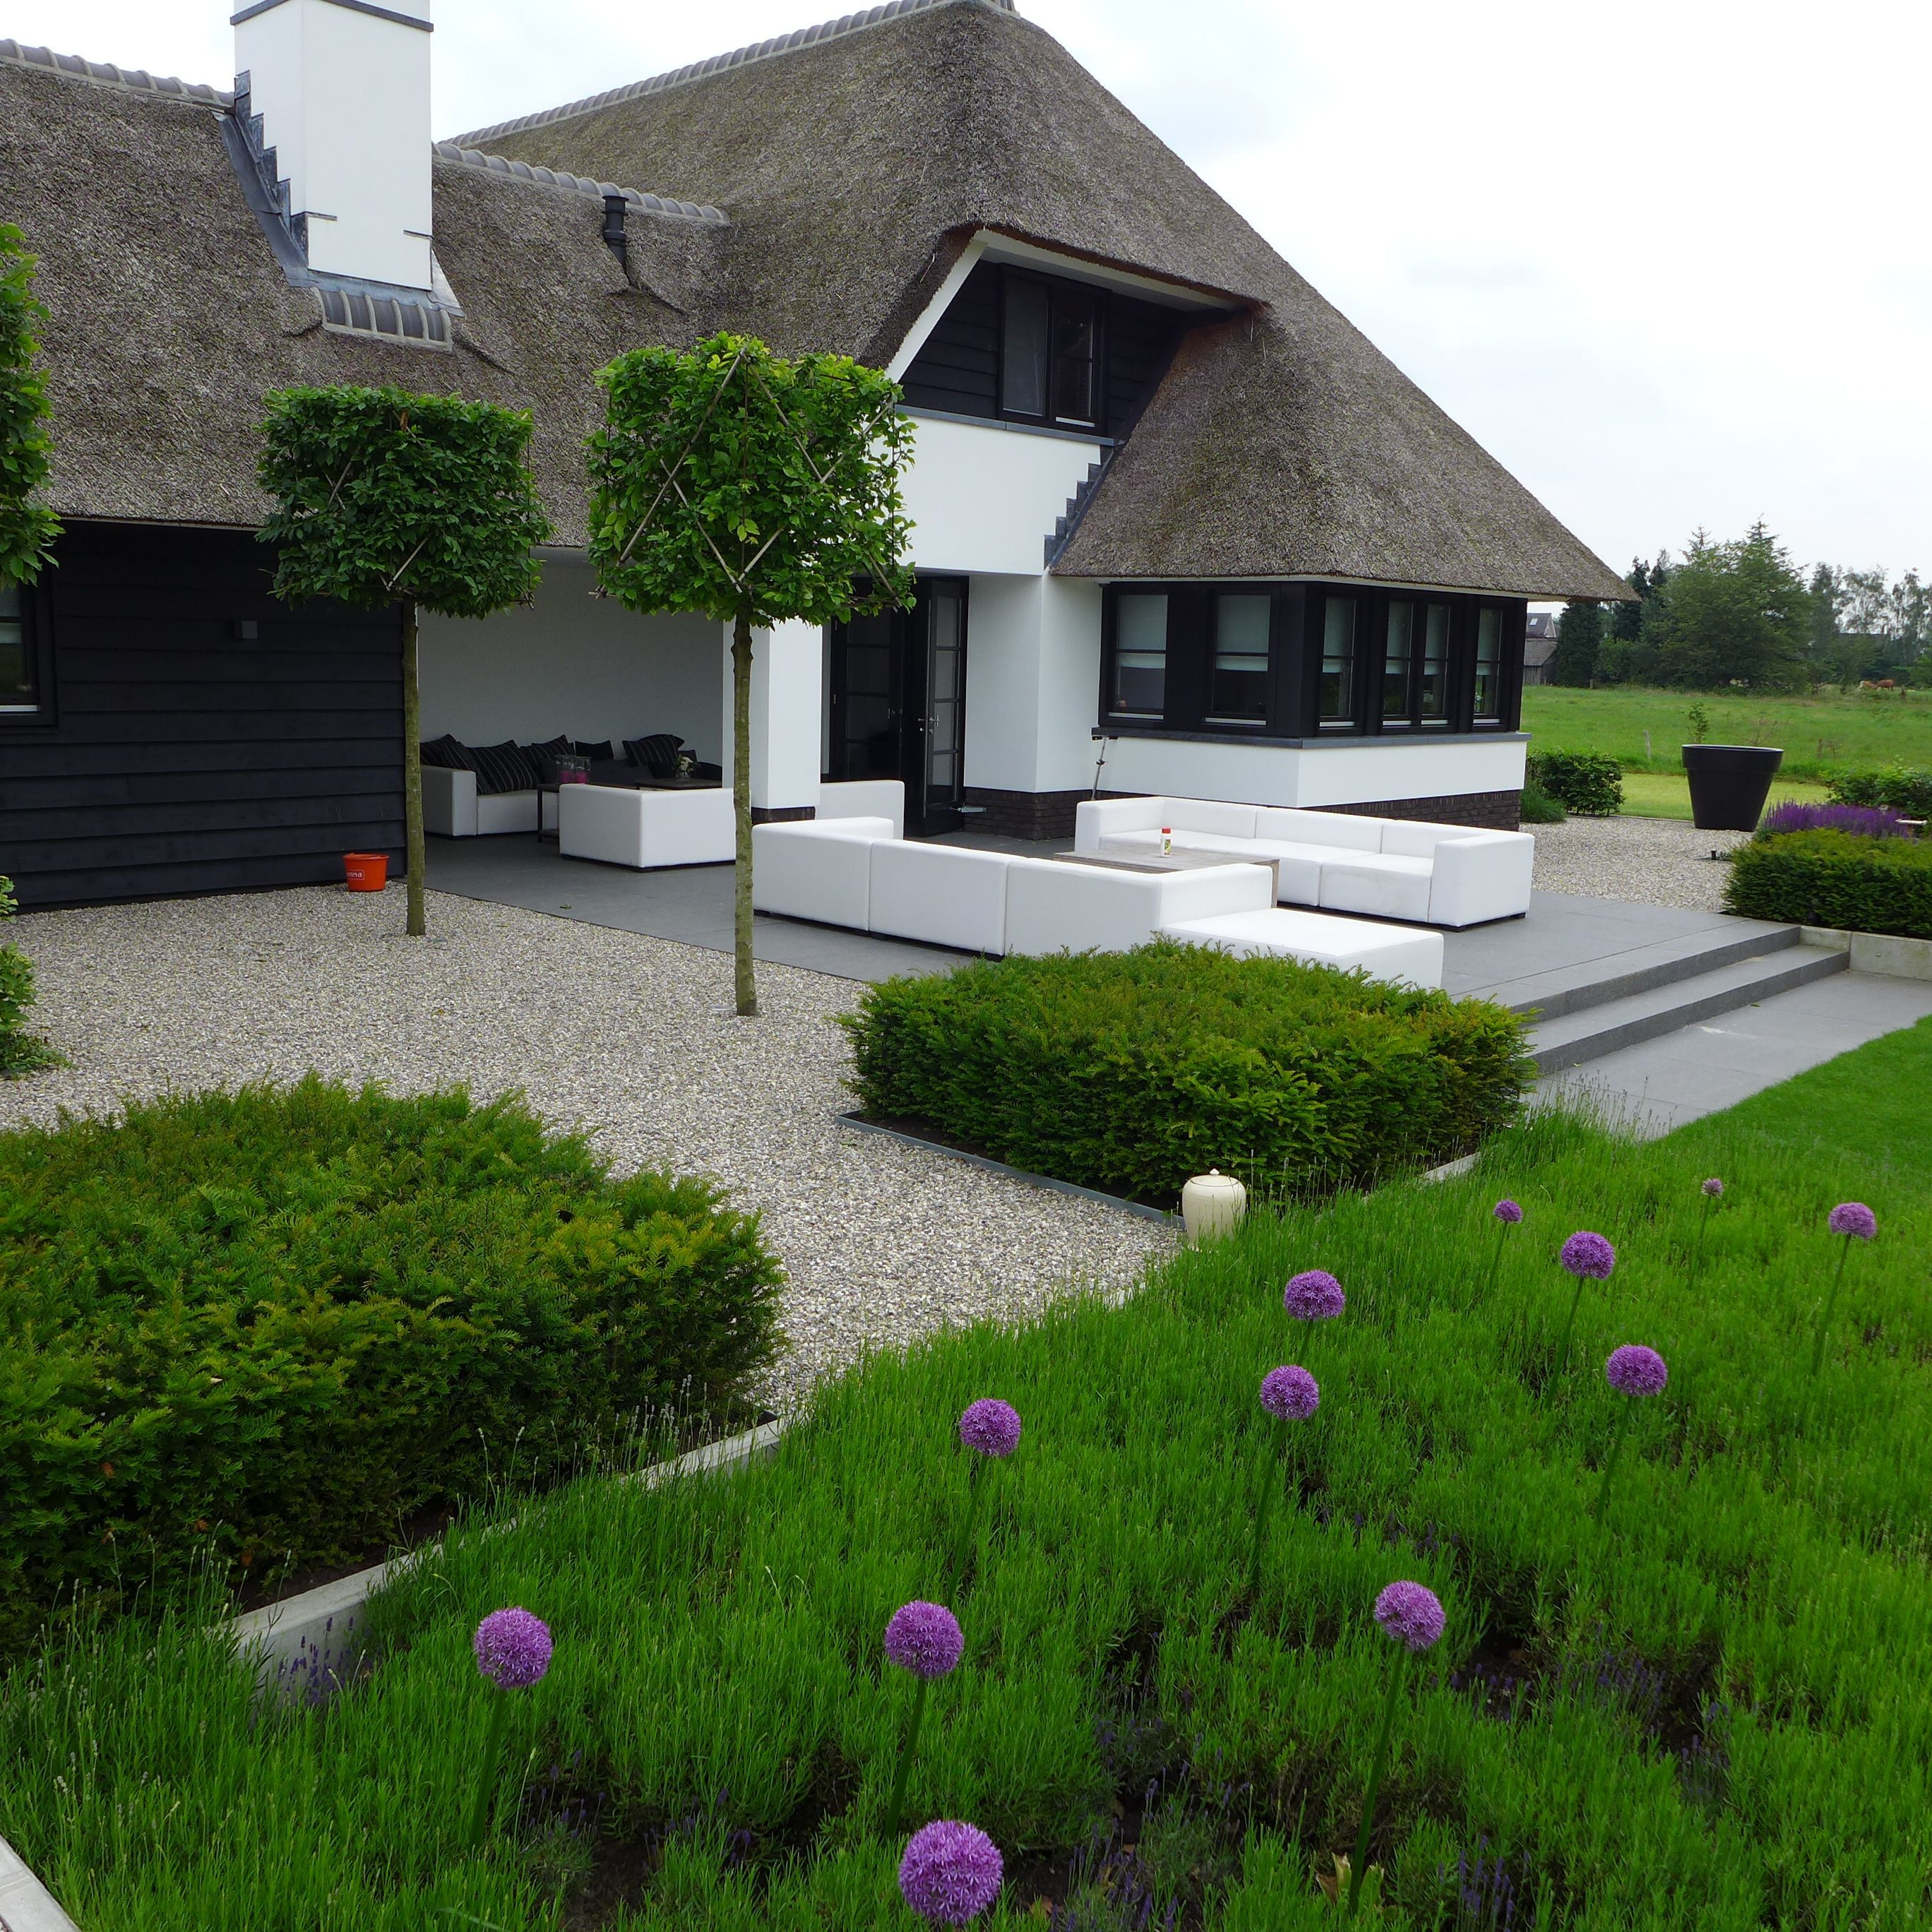 id e massif pour marche terrasses en 2019 casa jardin jard n minimalista et caminos jardin. Black Bedroom Furniture Sets. Home Design Ideas